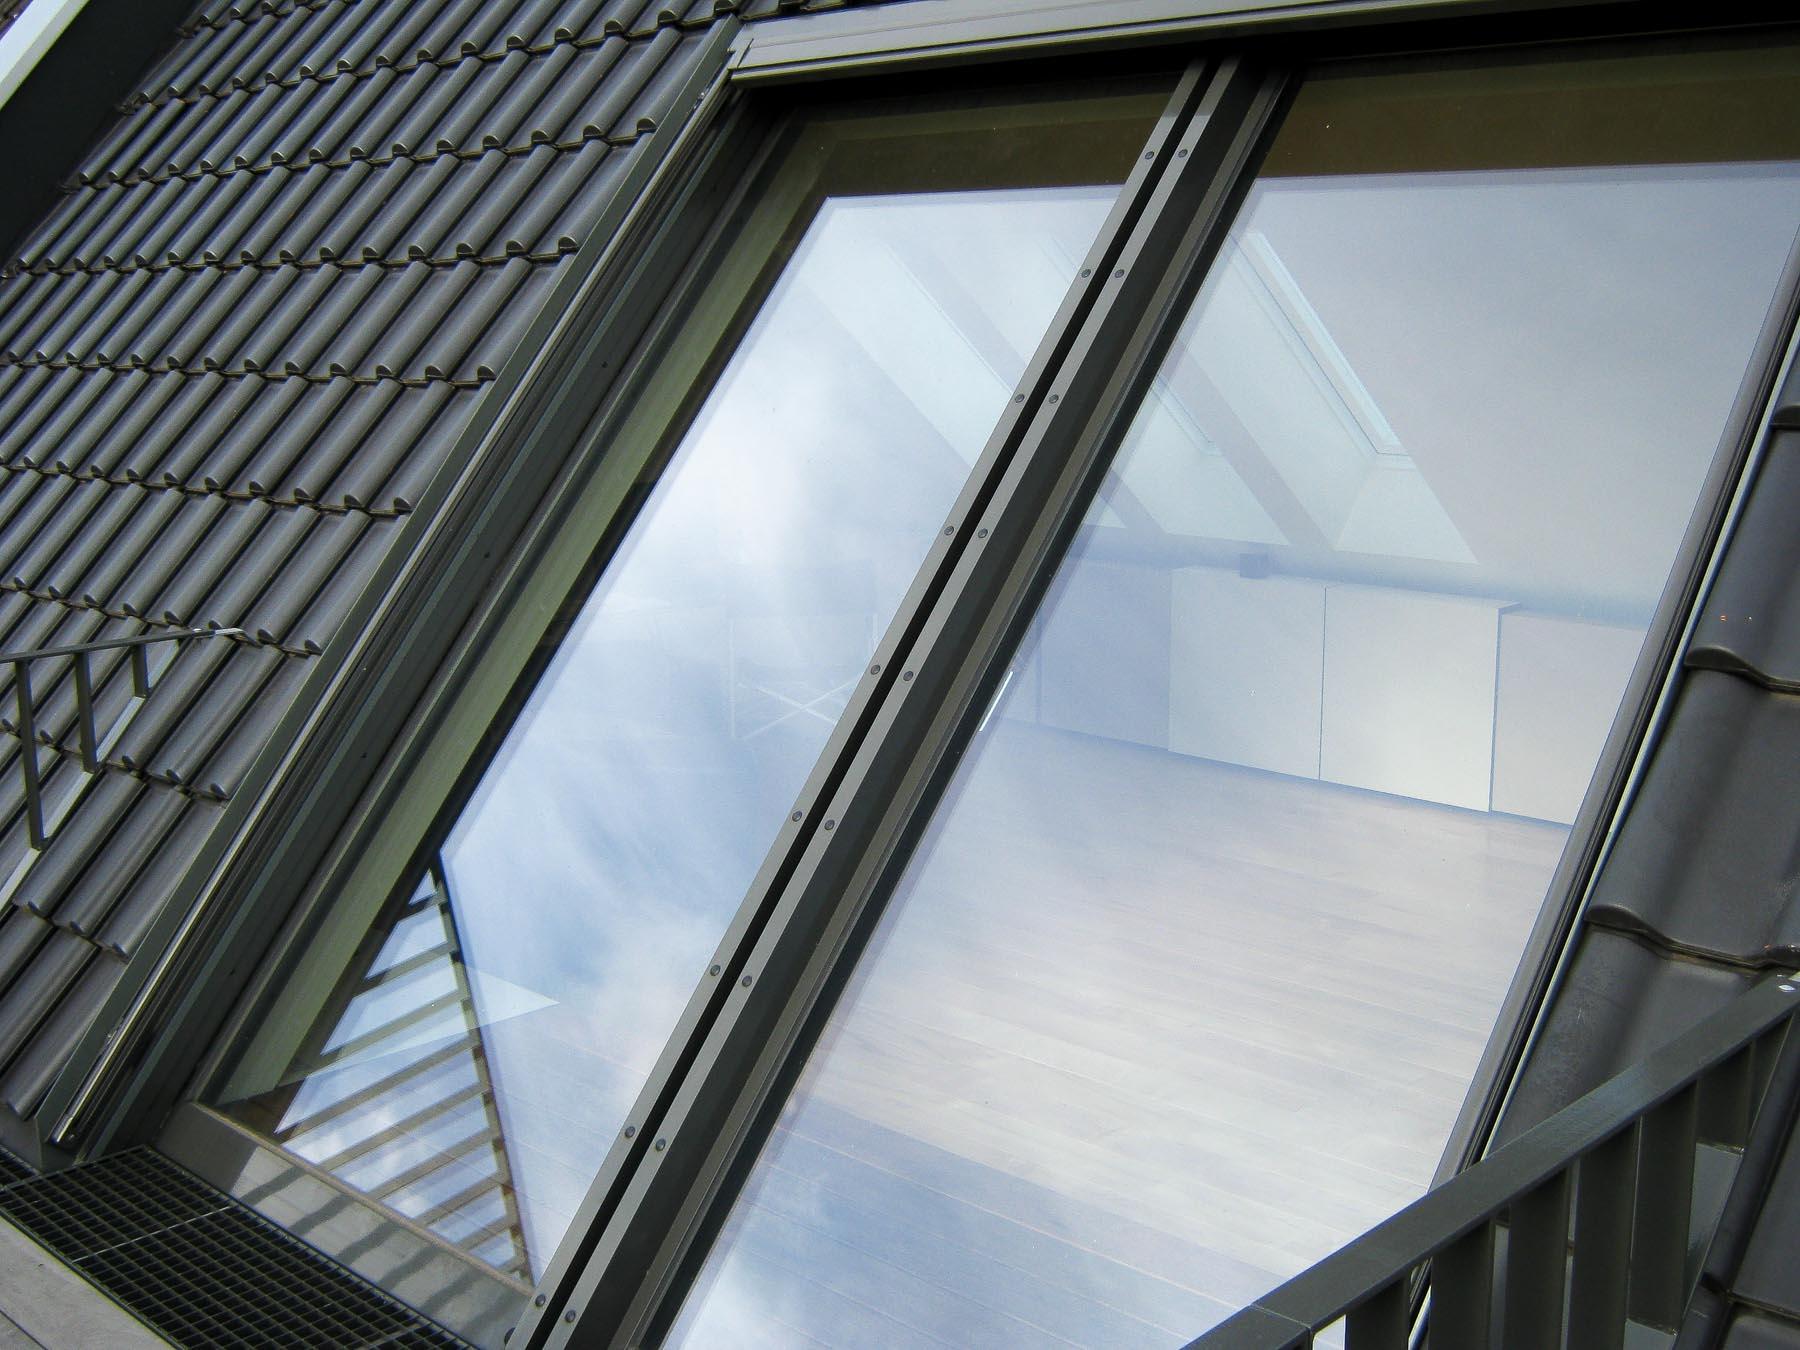 Panorma Dachschiebefenster in Krefeld (Objekt 1106). 4 teiliges Panorma Dachschiebefenster (Typ AH) mit Einschubtaschen